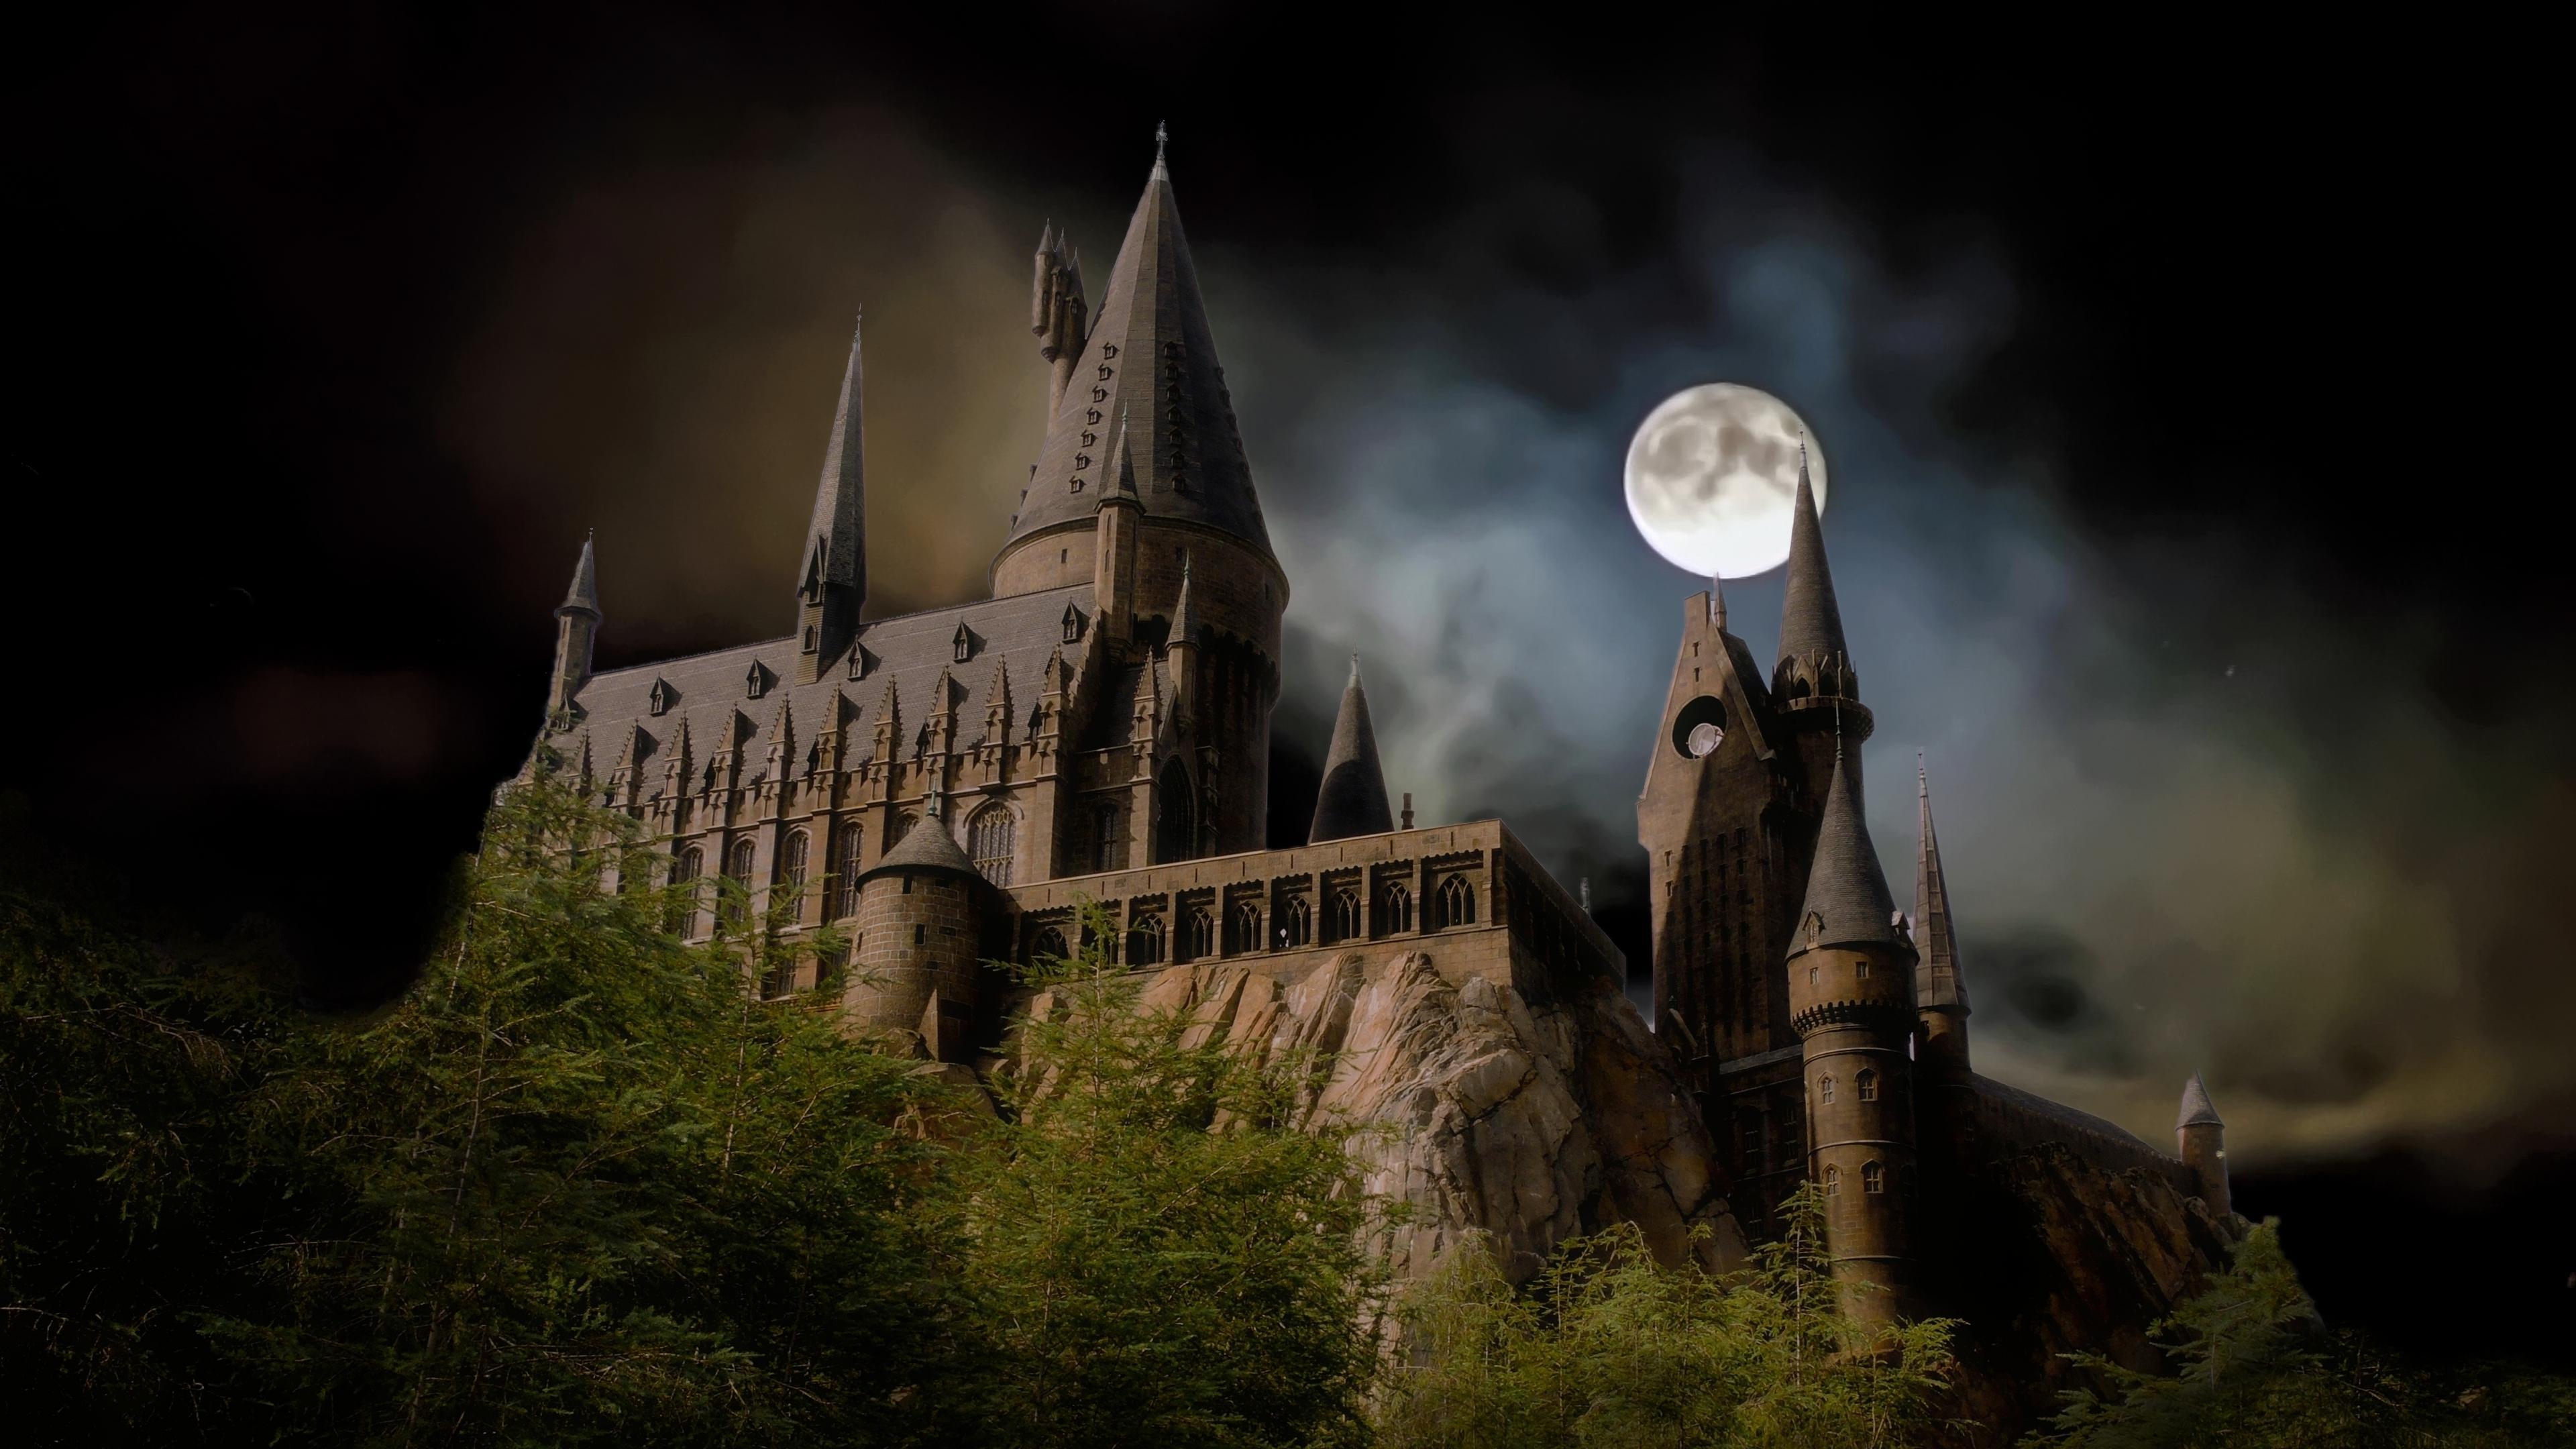 Hogwarts 4k Wallpapers For Your Desktop Or Mobile Screen